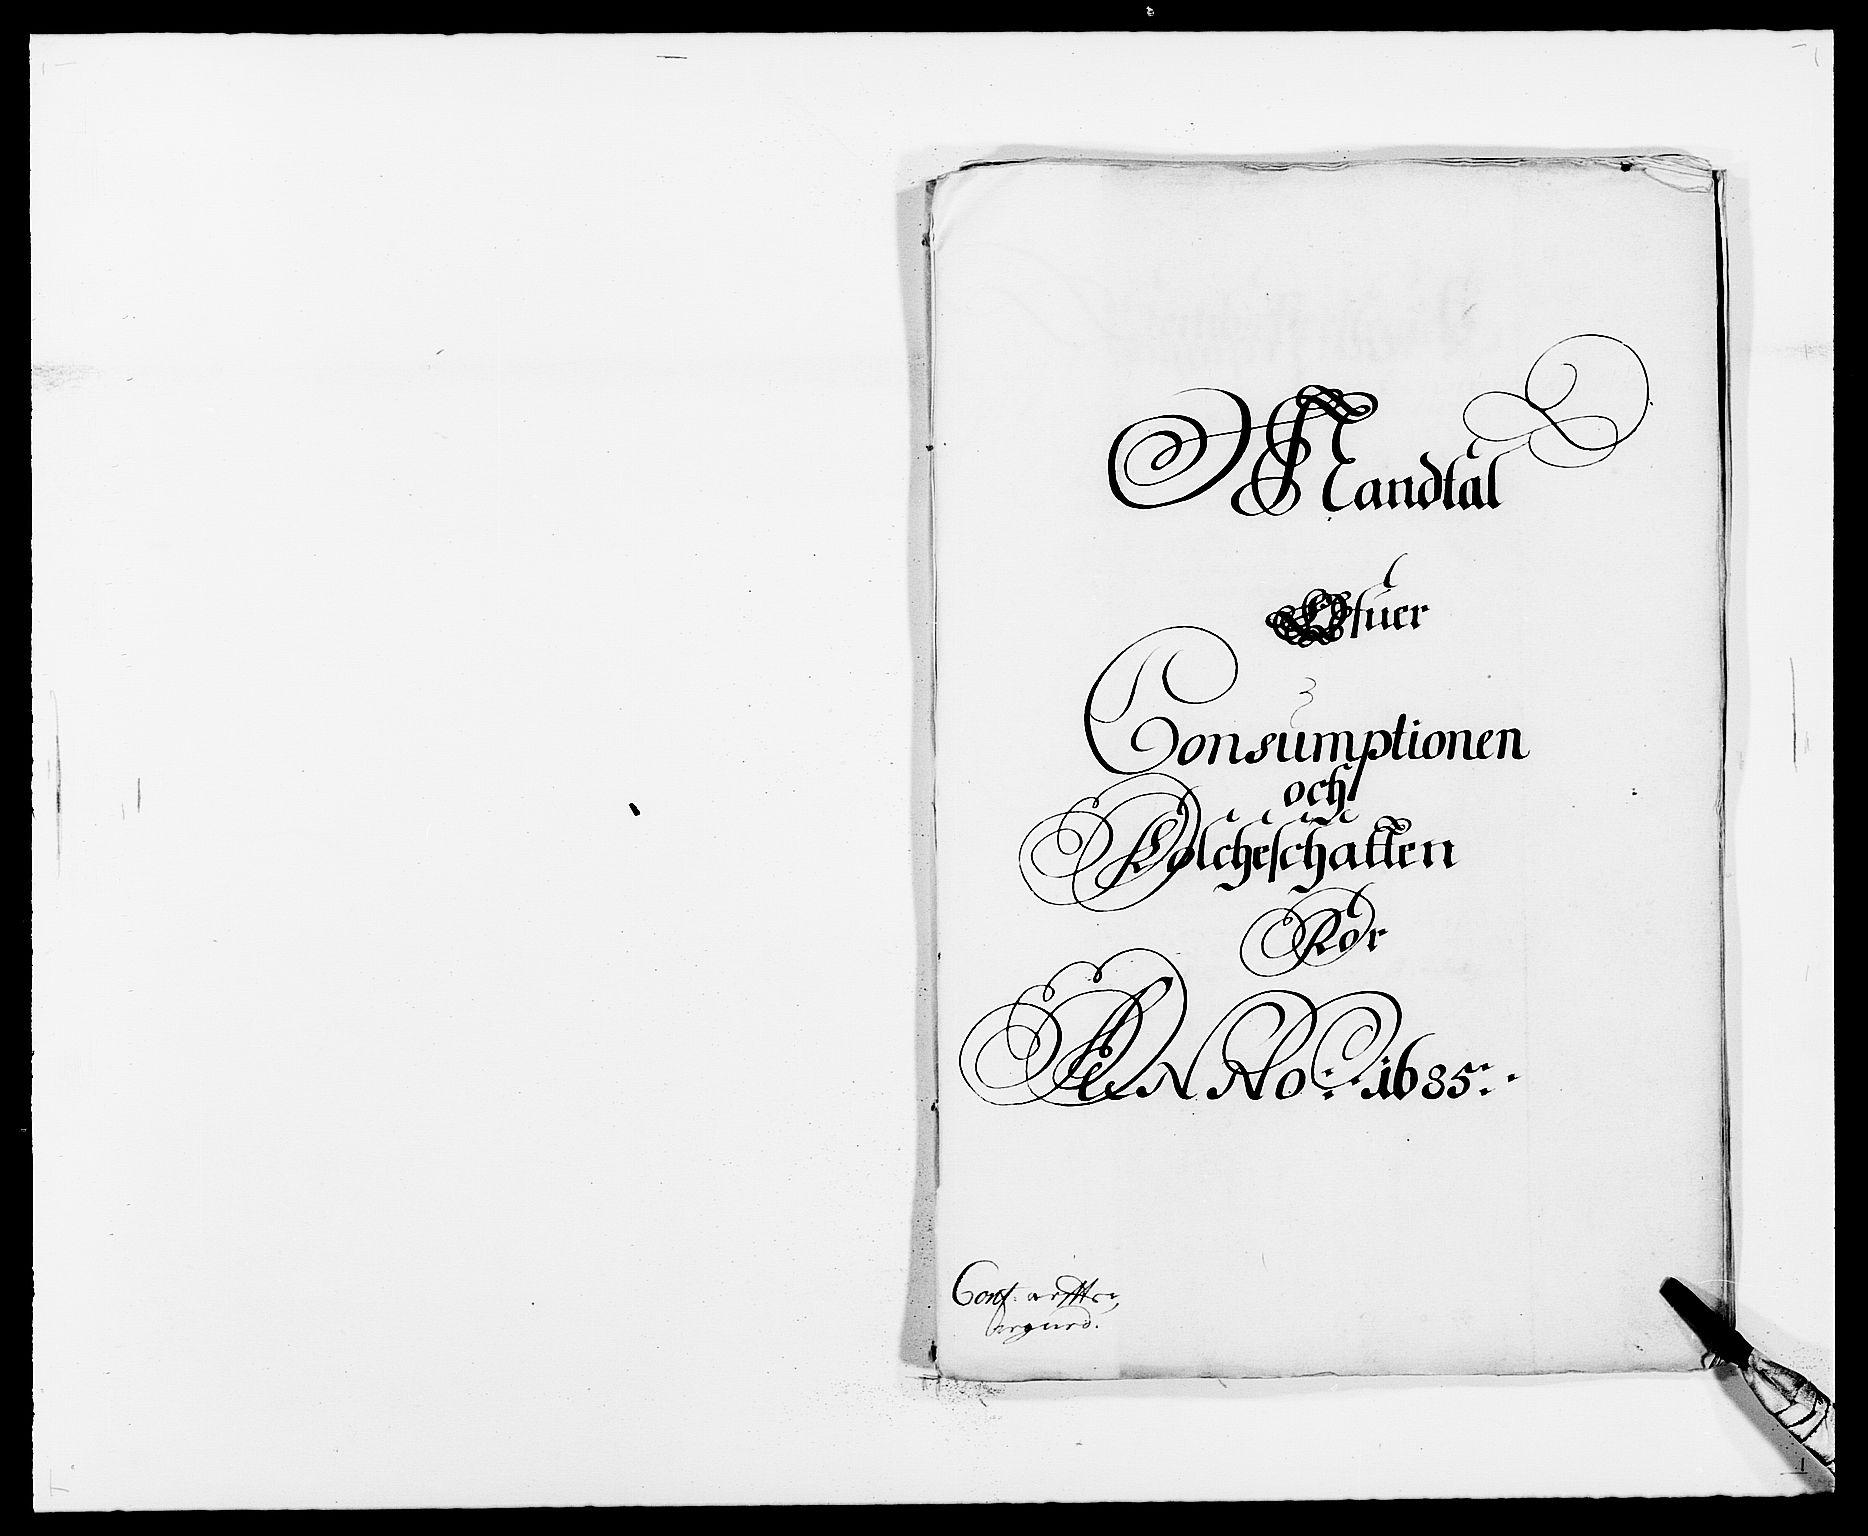 RA, Rentekammeret inntil 1814, Reviderte regnskaper, Fogderegnskap, R32/L1856: Fogderegnskap Jarlsberg grevskap, 1685, s. 333